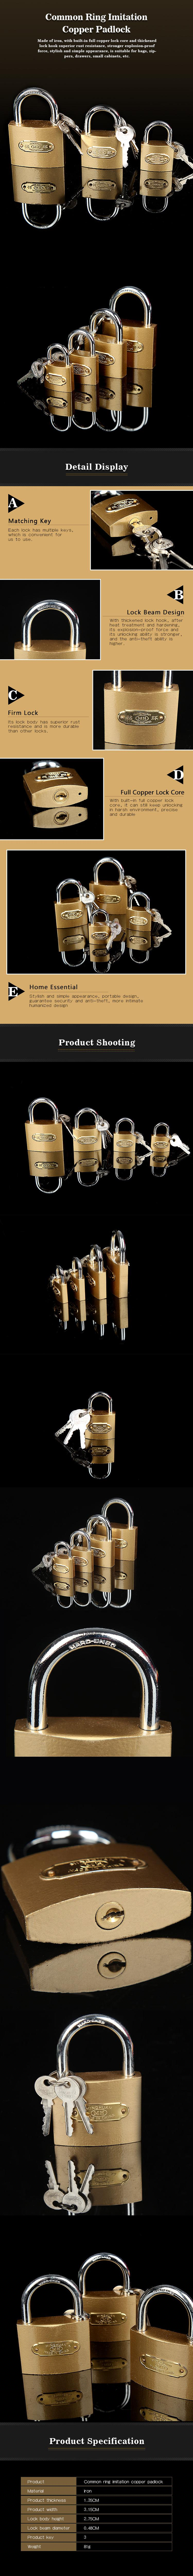 Common Ring Imitation Copper Padlock, 1.2inch Custom Open Power Meter Box Lock Imitation Copper Padlock 0